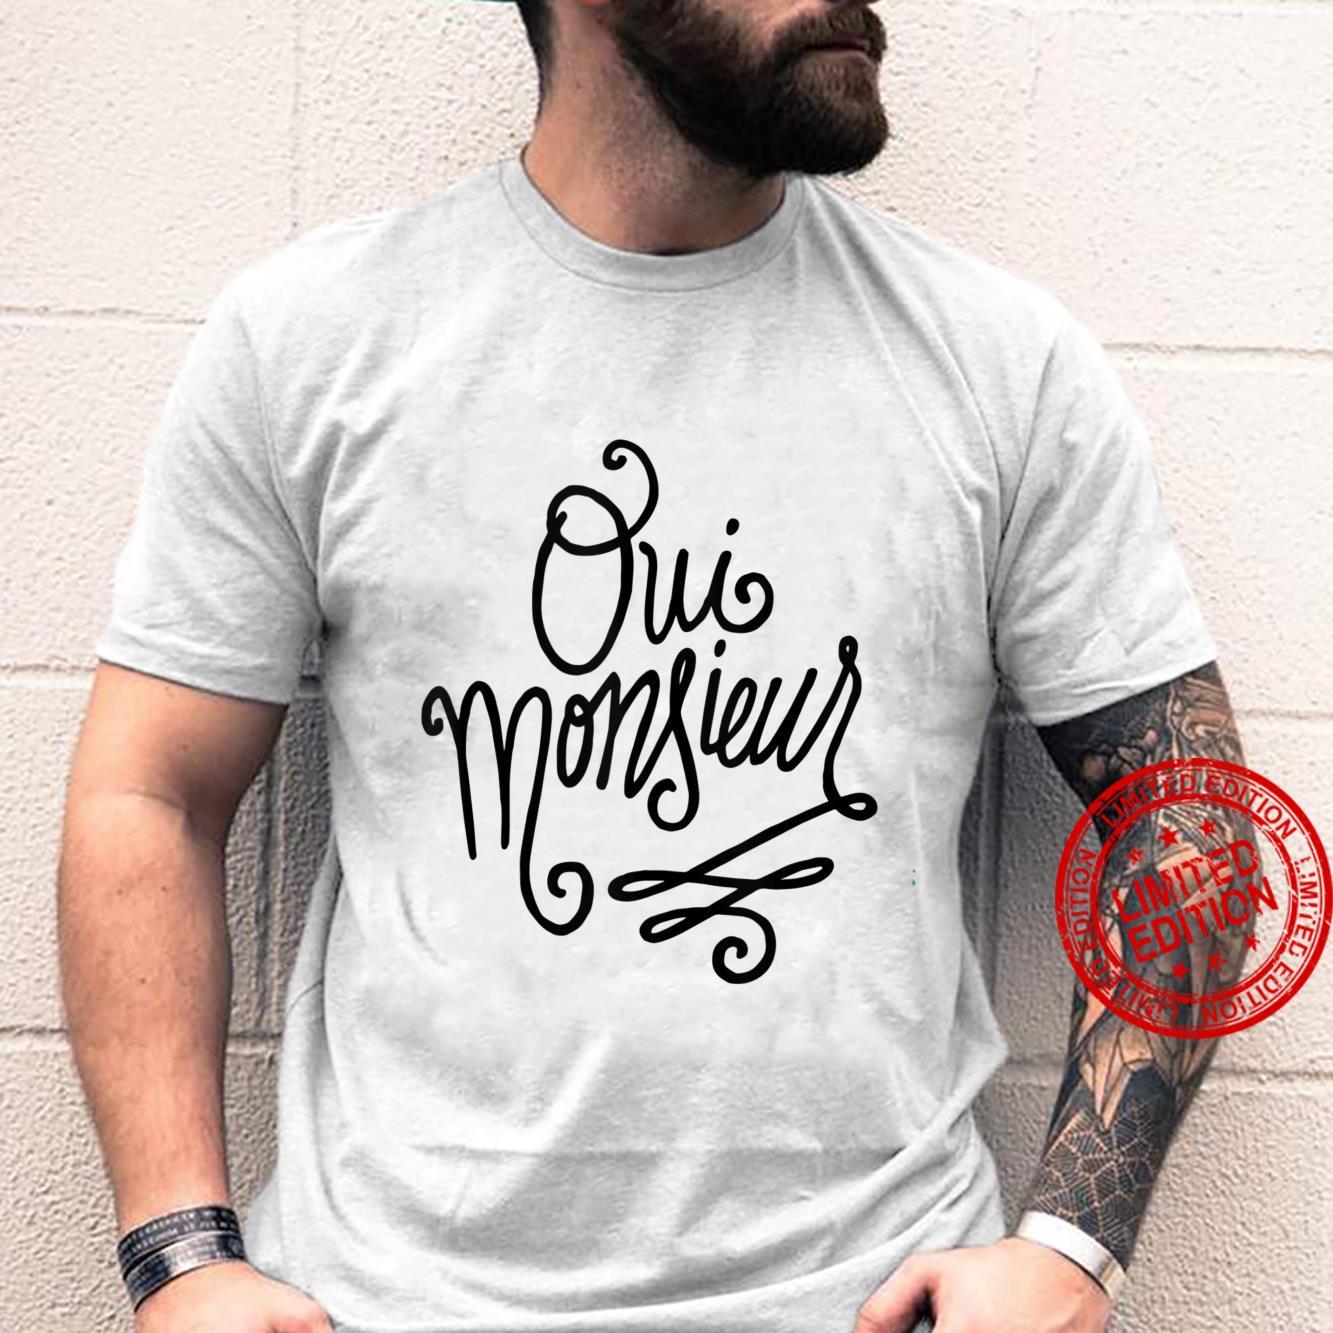 Oui Monsieur French Shirt